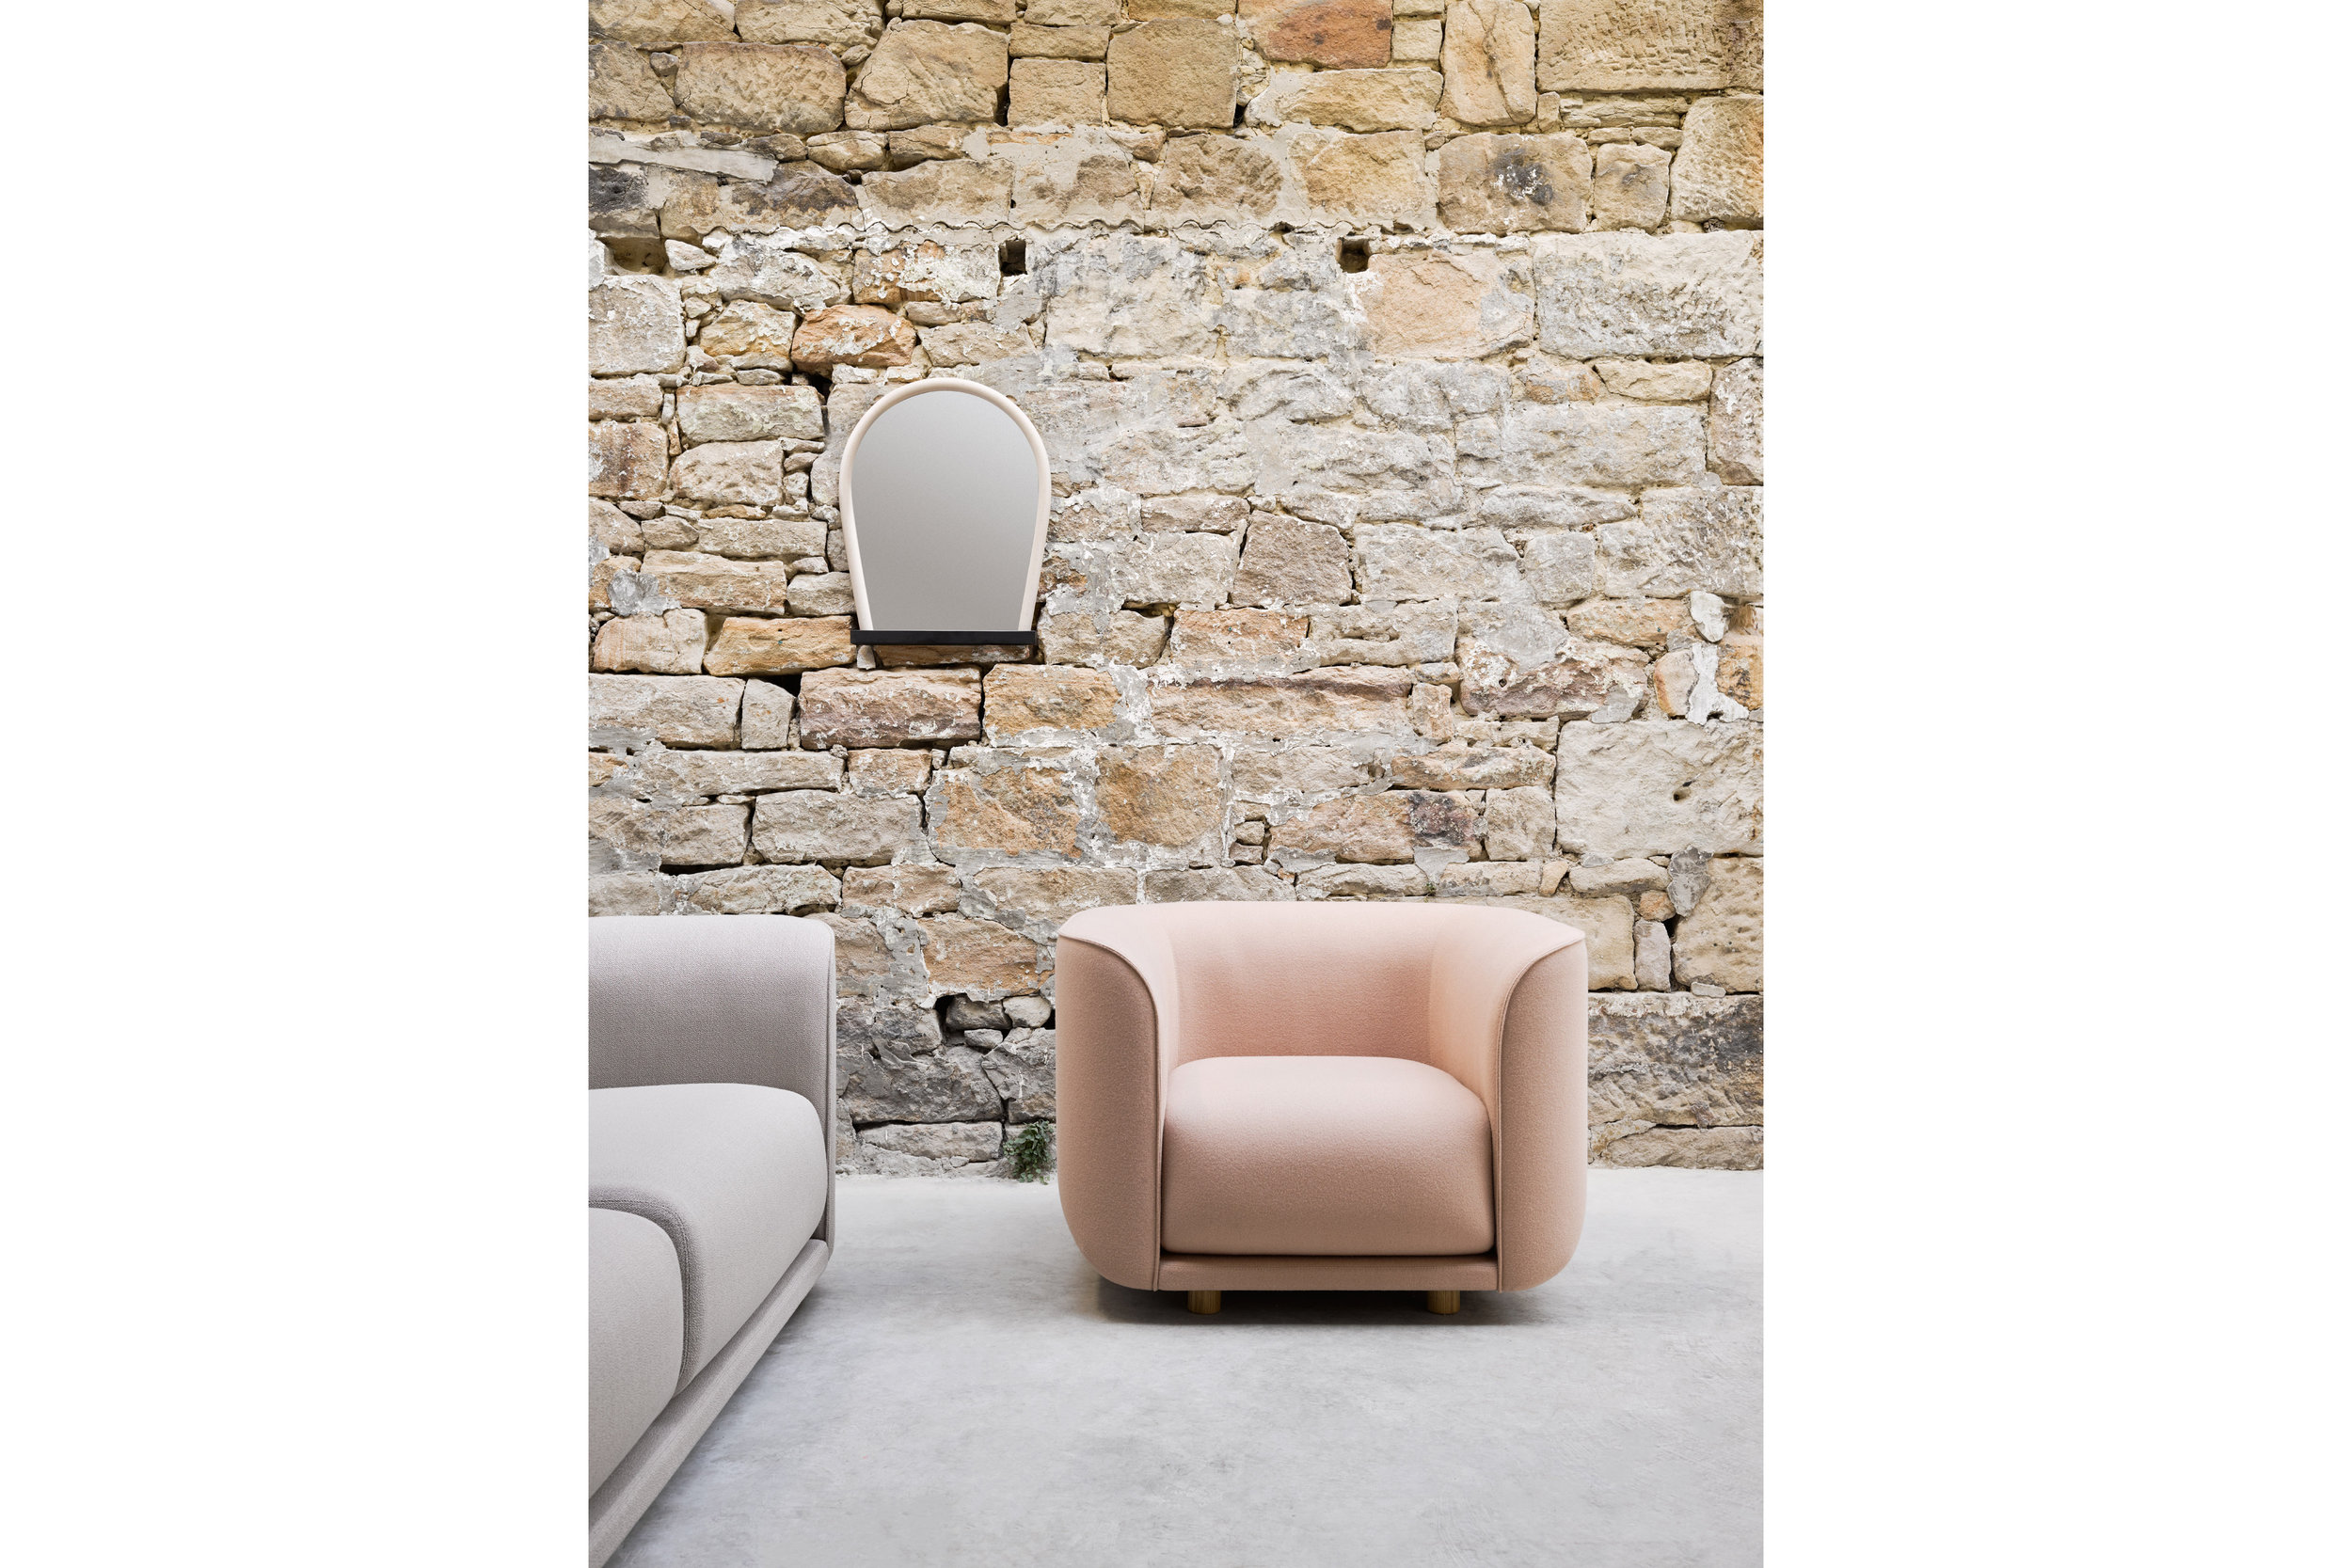 nau-new-australian-design-furniture_dezeen_2364_col_2.jpg